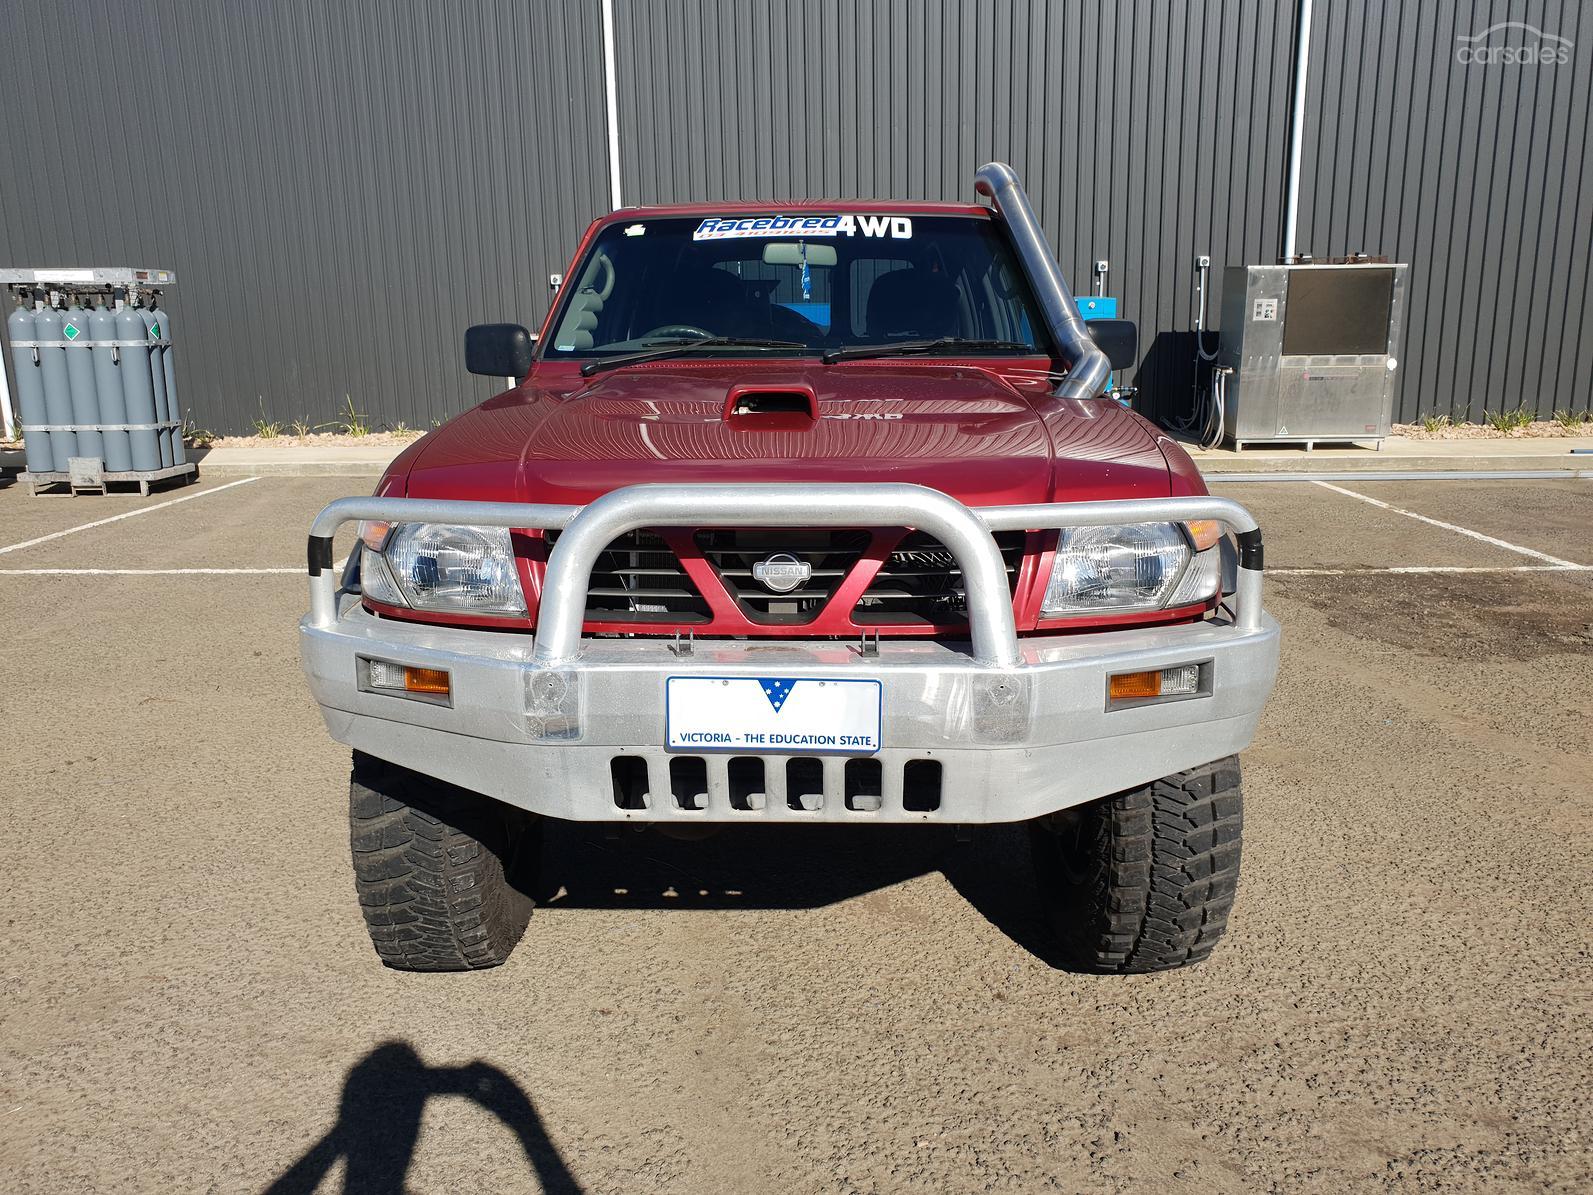 1998 Nissan Patrol DX5 GU Manual 4x4-SSE-AD-6091043